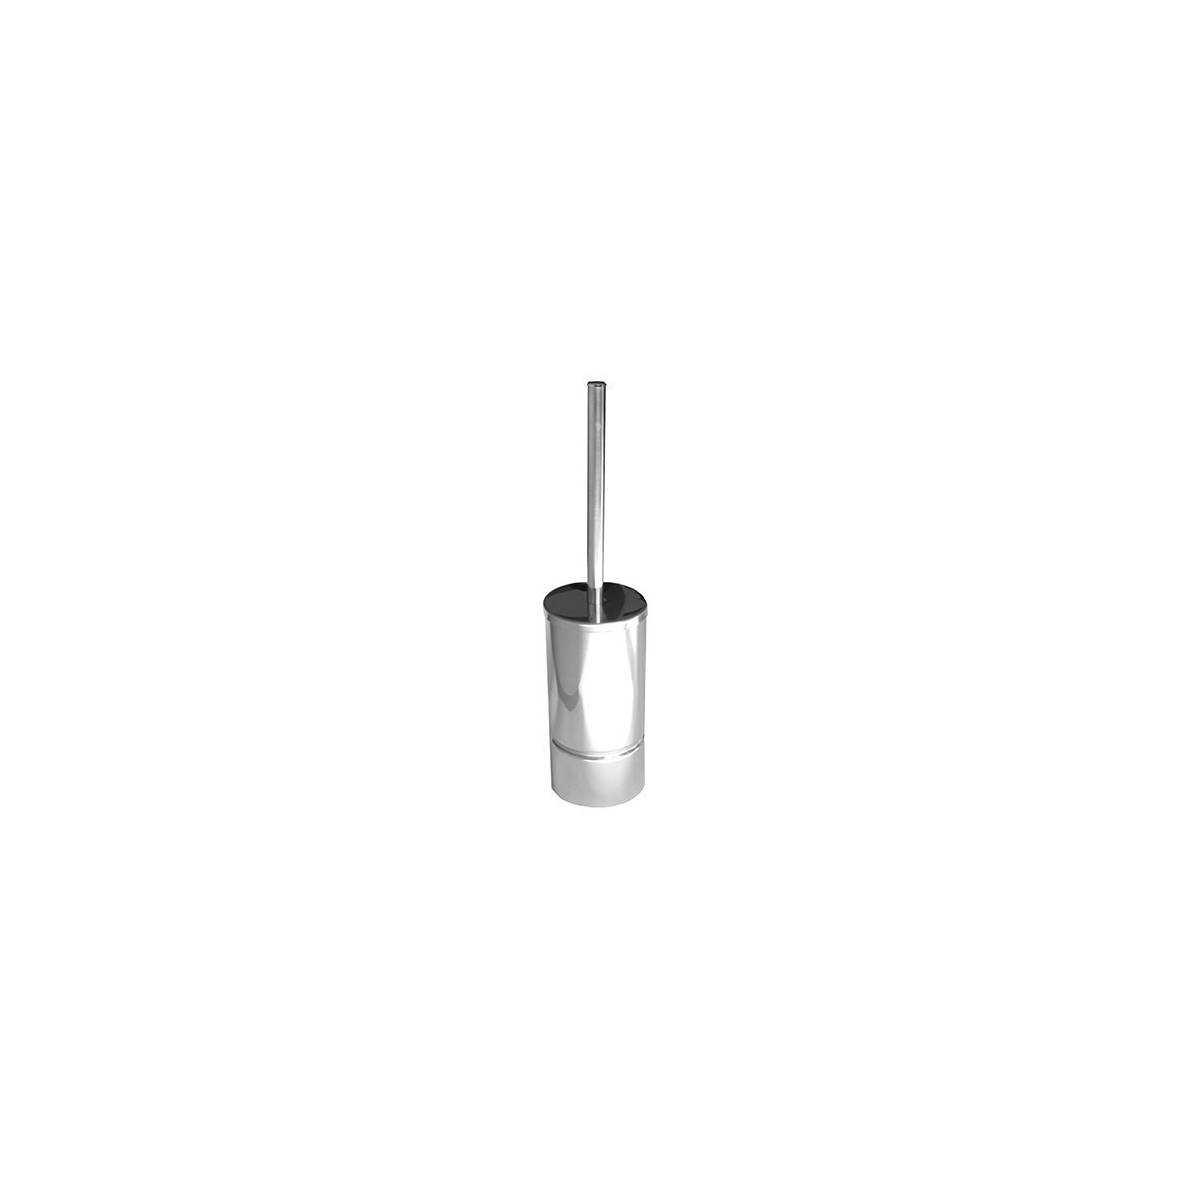 Щетка для унитаза (LS095) LS-095 Gatto